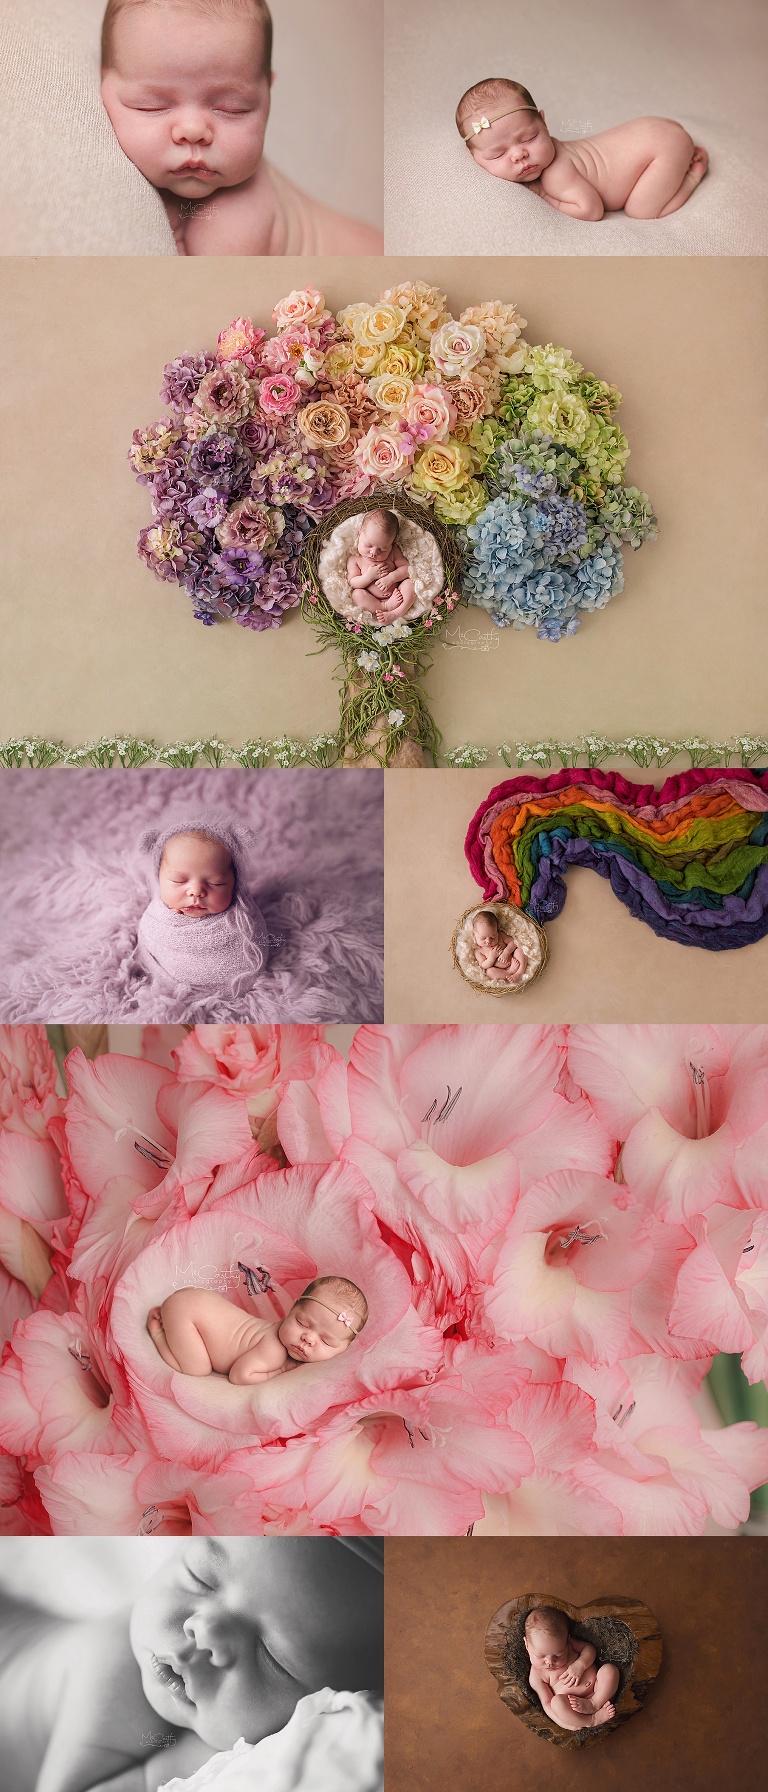 newborn photography sample gallery in strathroy ontario